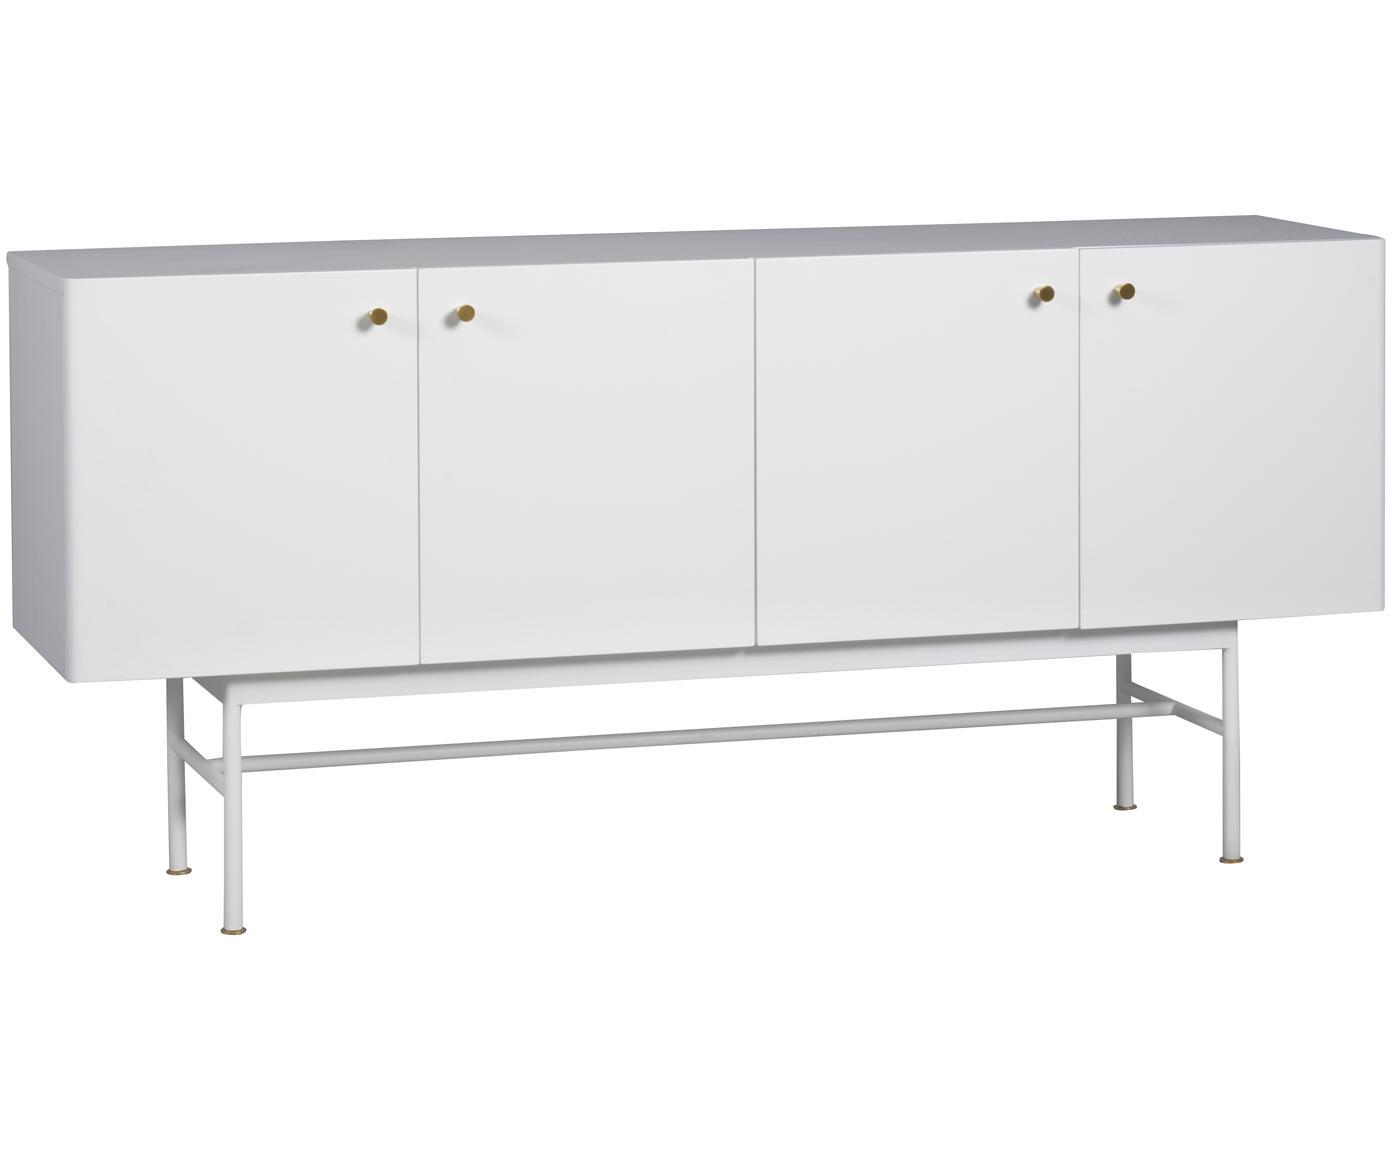 Aparador de diseño Glendale, Estructura: tablero de fibras de dens, Roble, blanco, An 160 x Al 75 cm